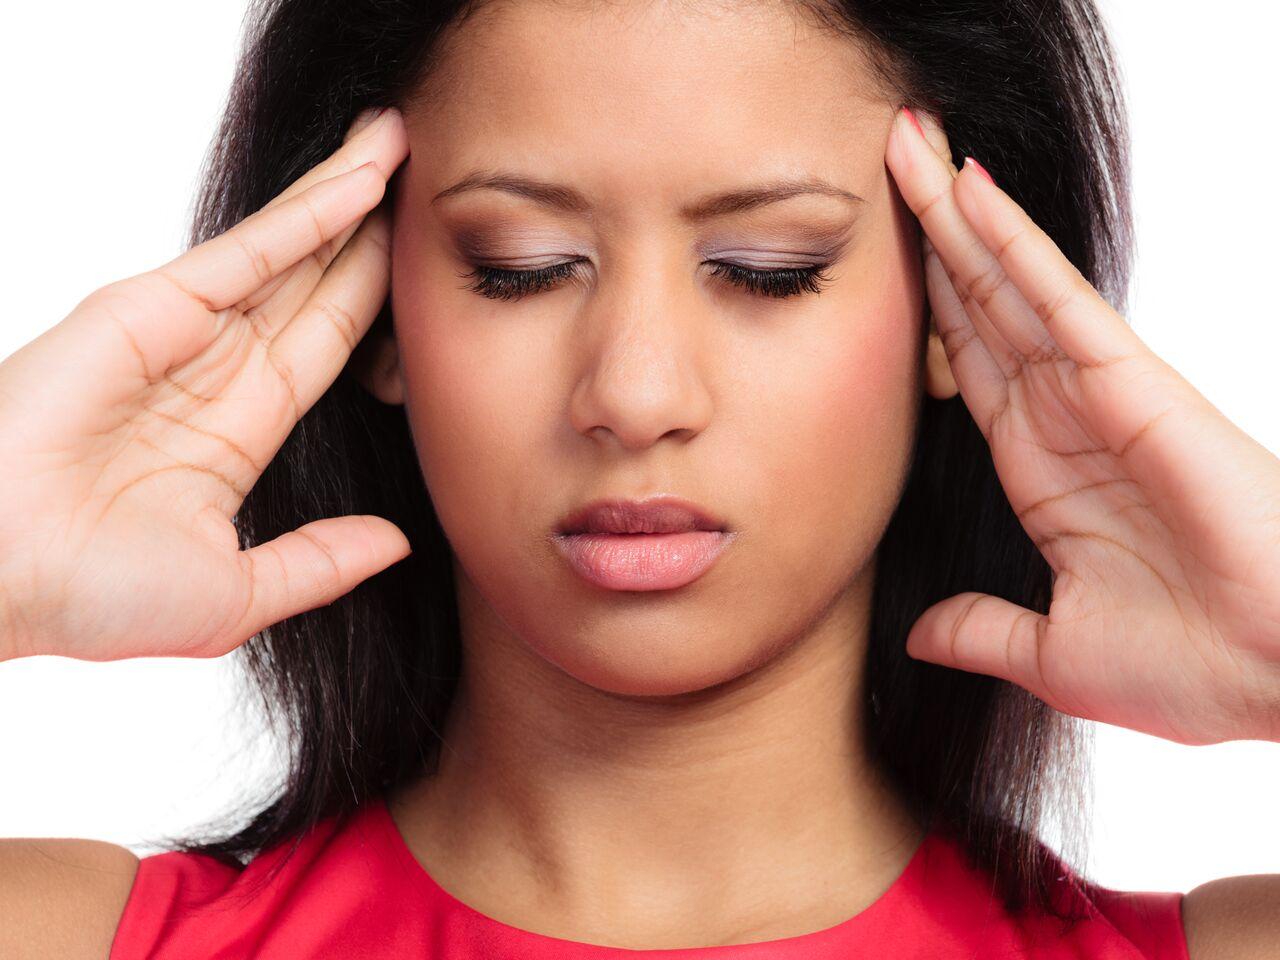 hodepine ved bevegelse